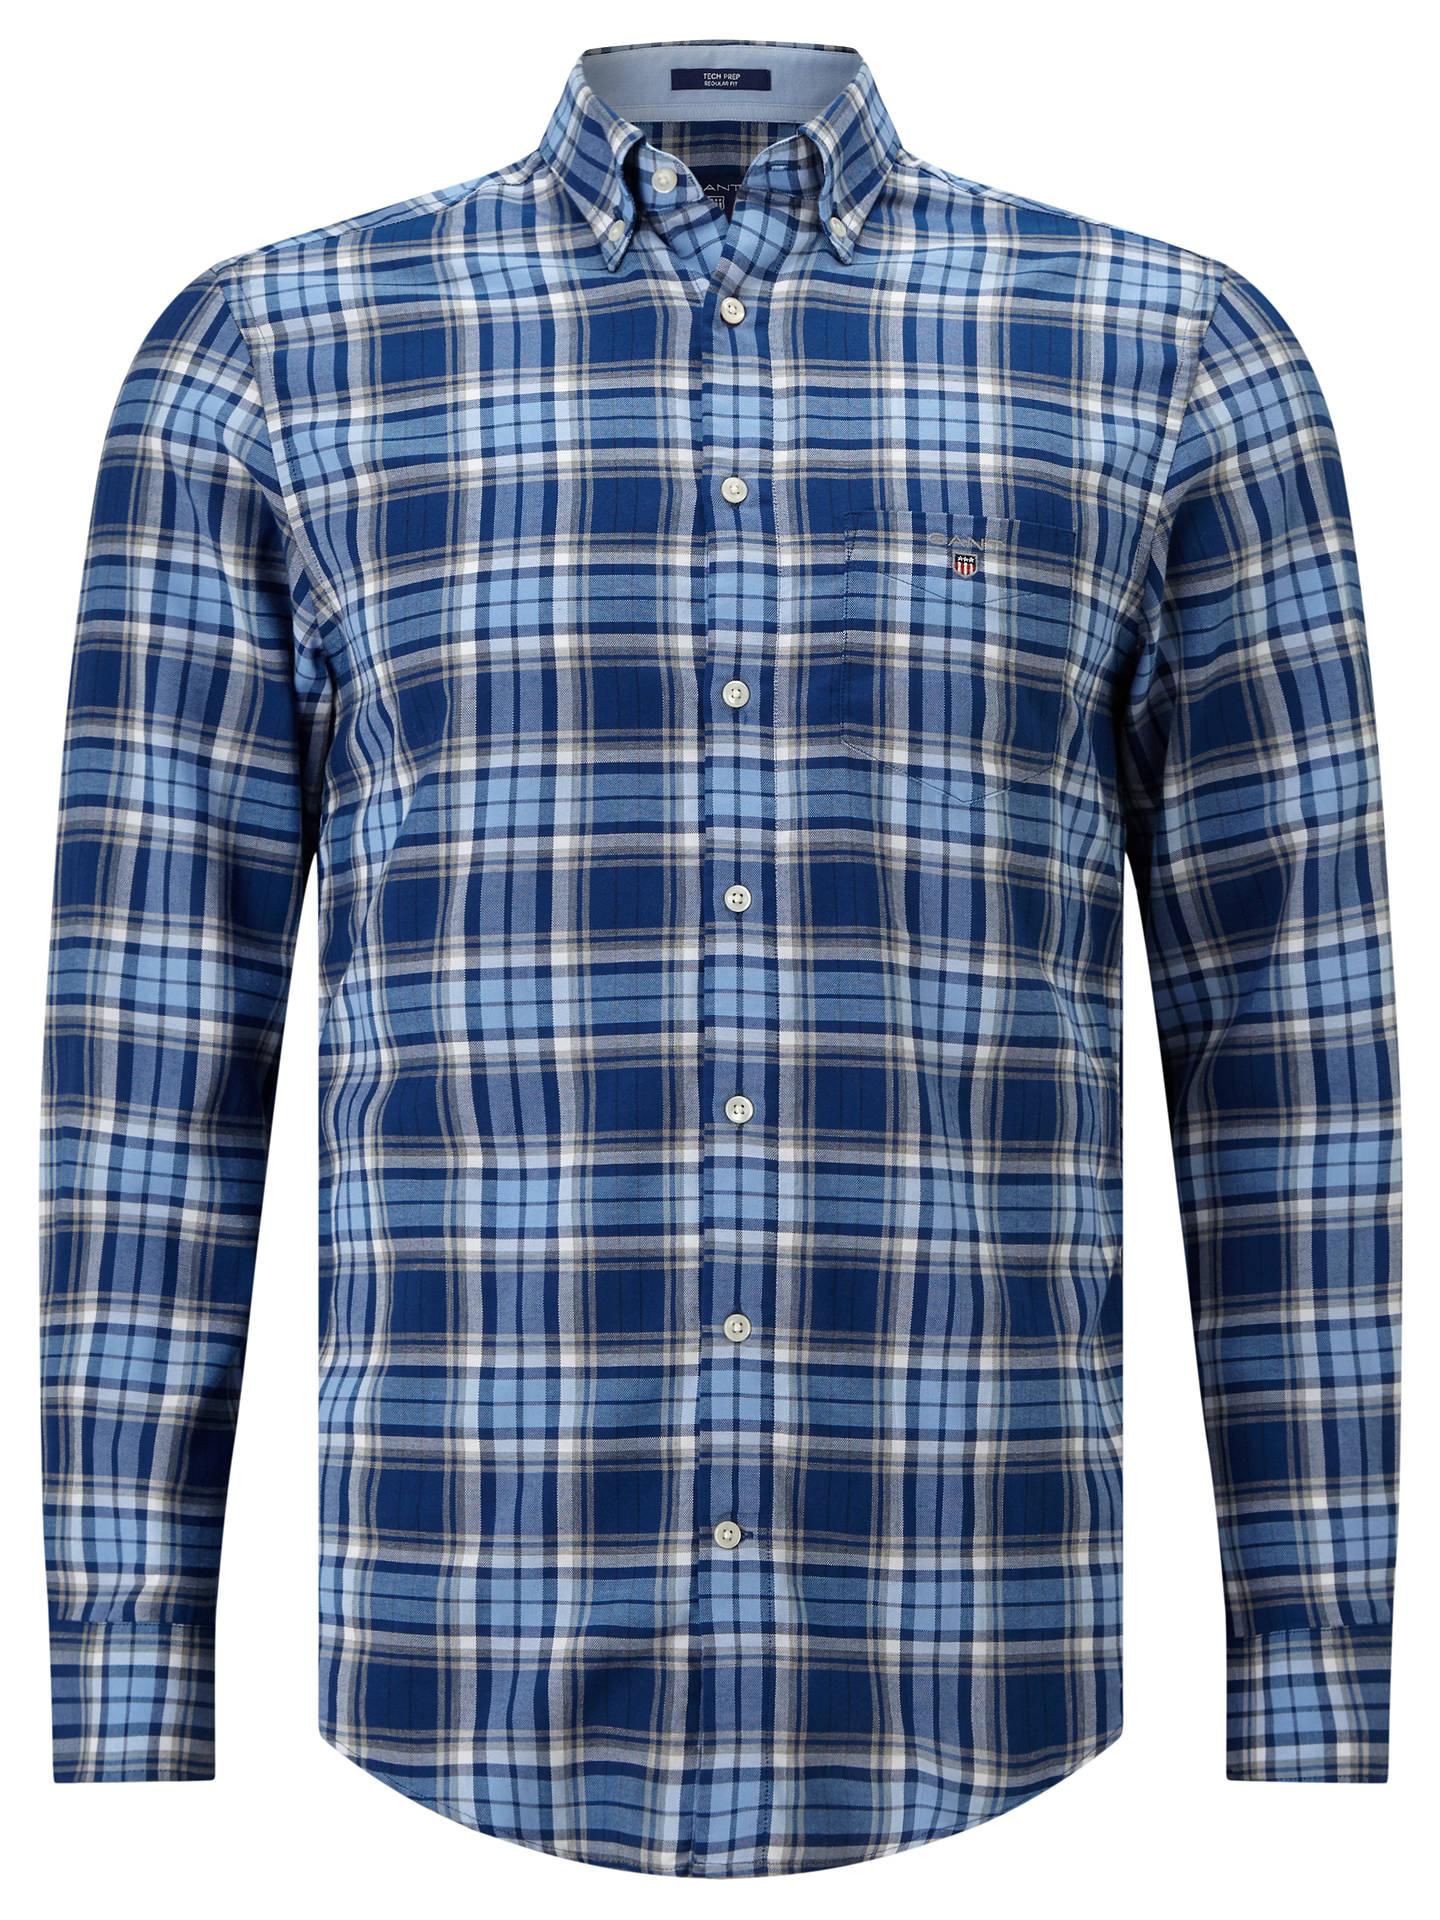 36fae3146e Buy Gant Oxford Plaid Regular Fit Shirt, Yale Blue, S Online at johnlewis.